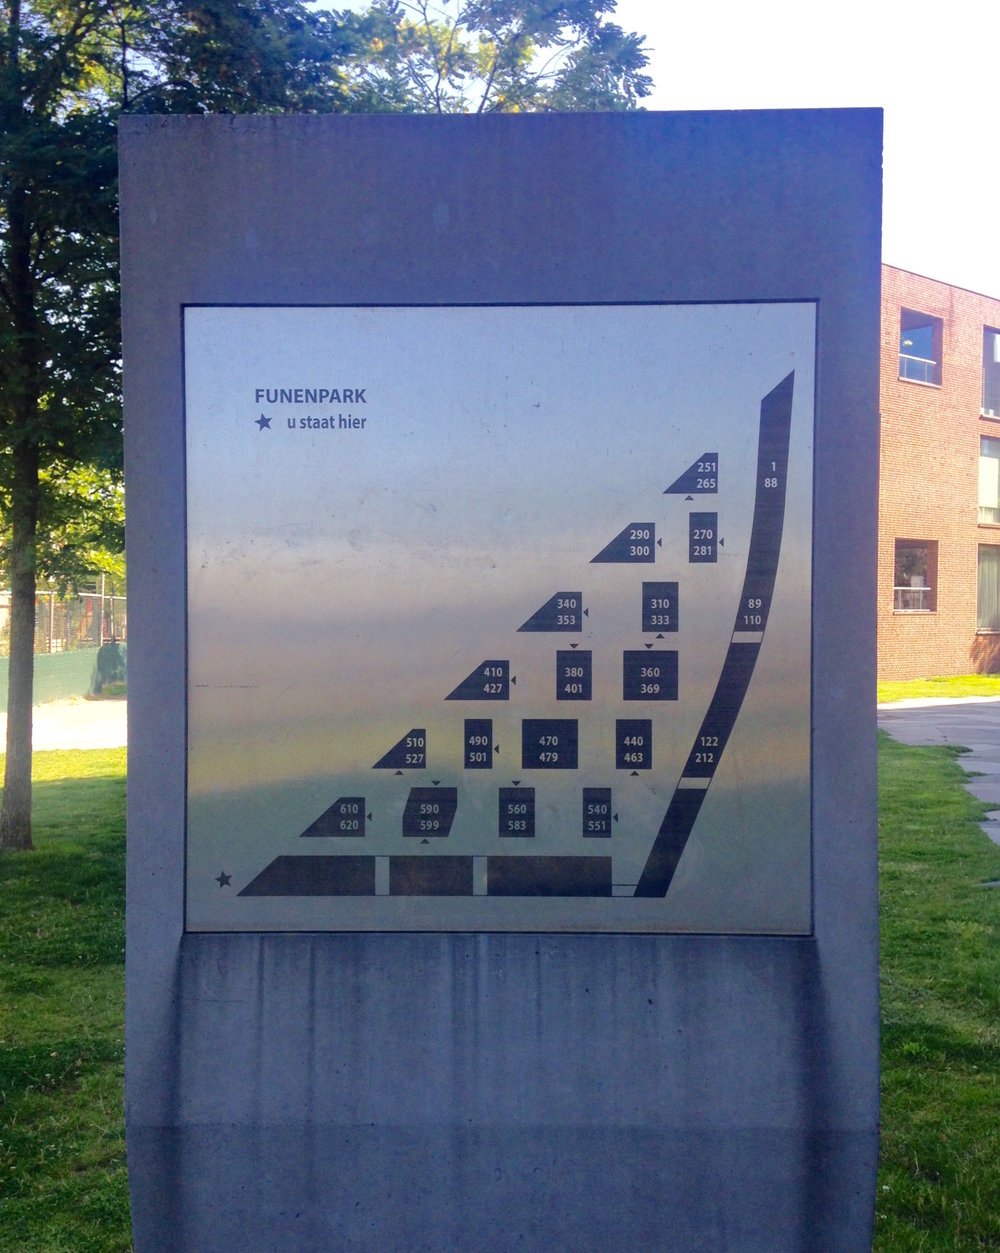 funenpark-estate-plan.jpg